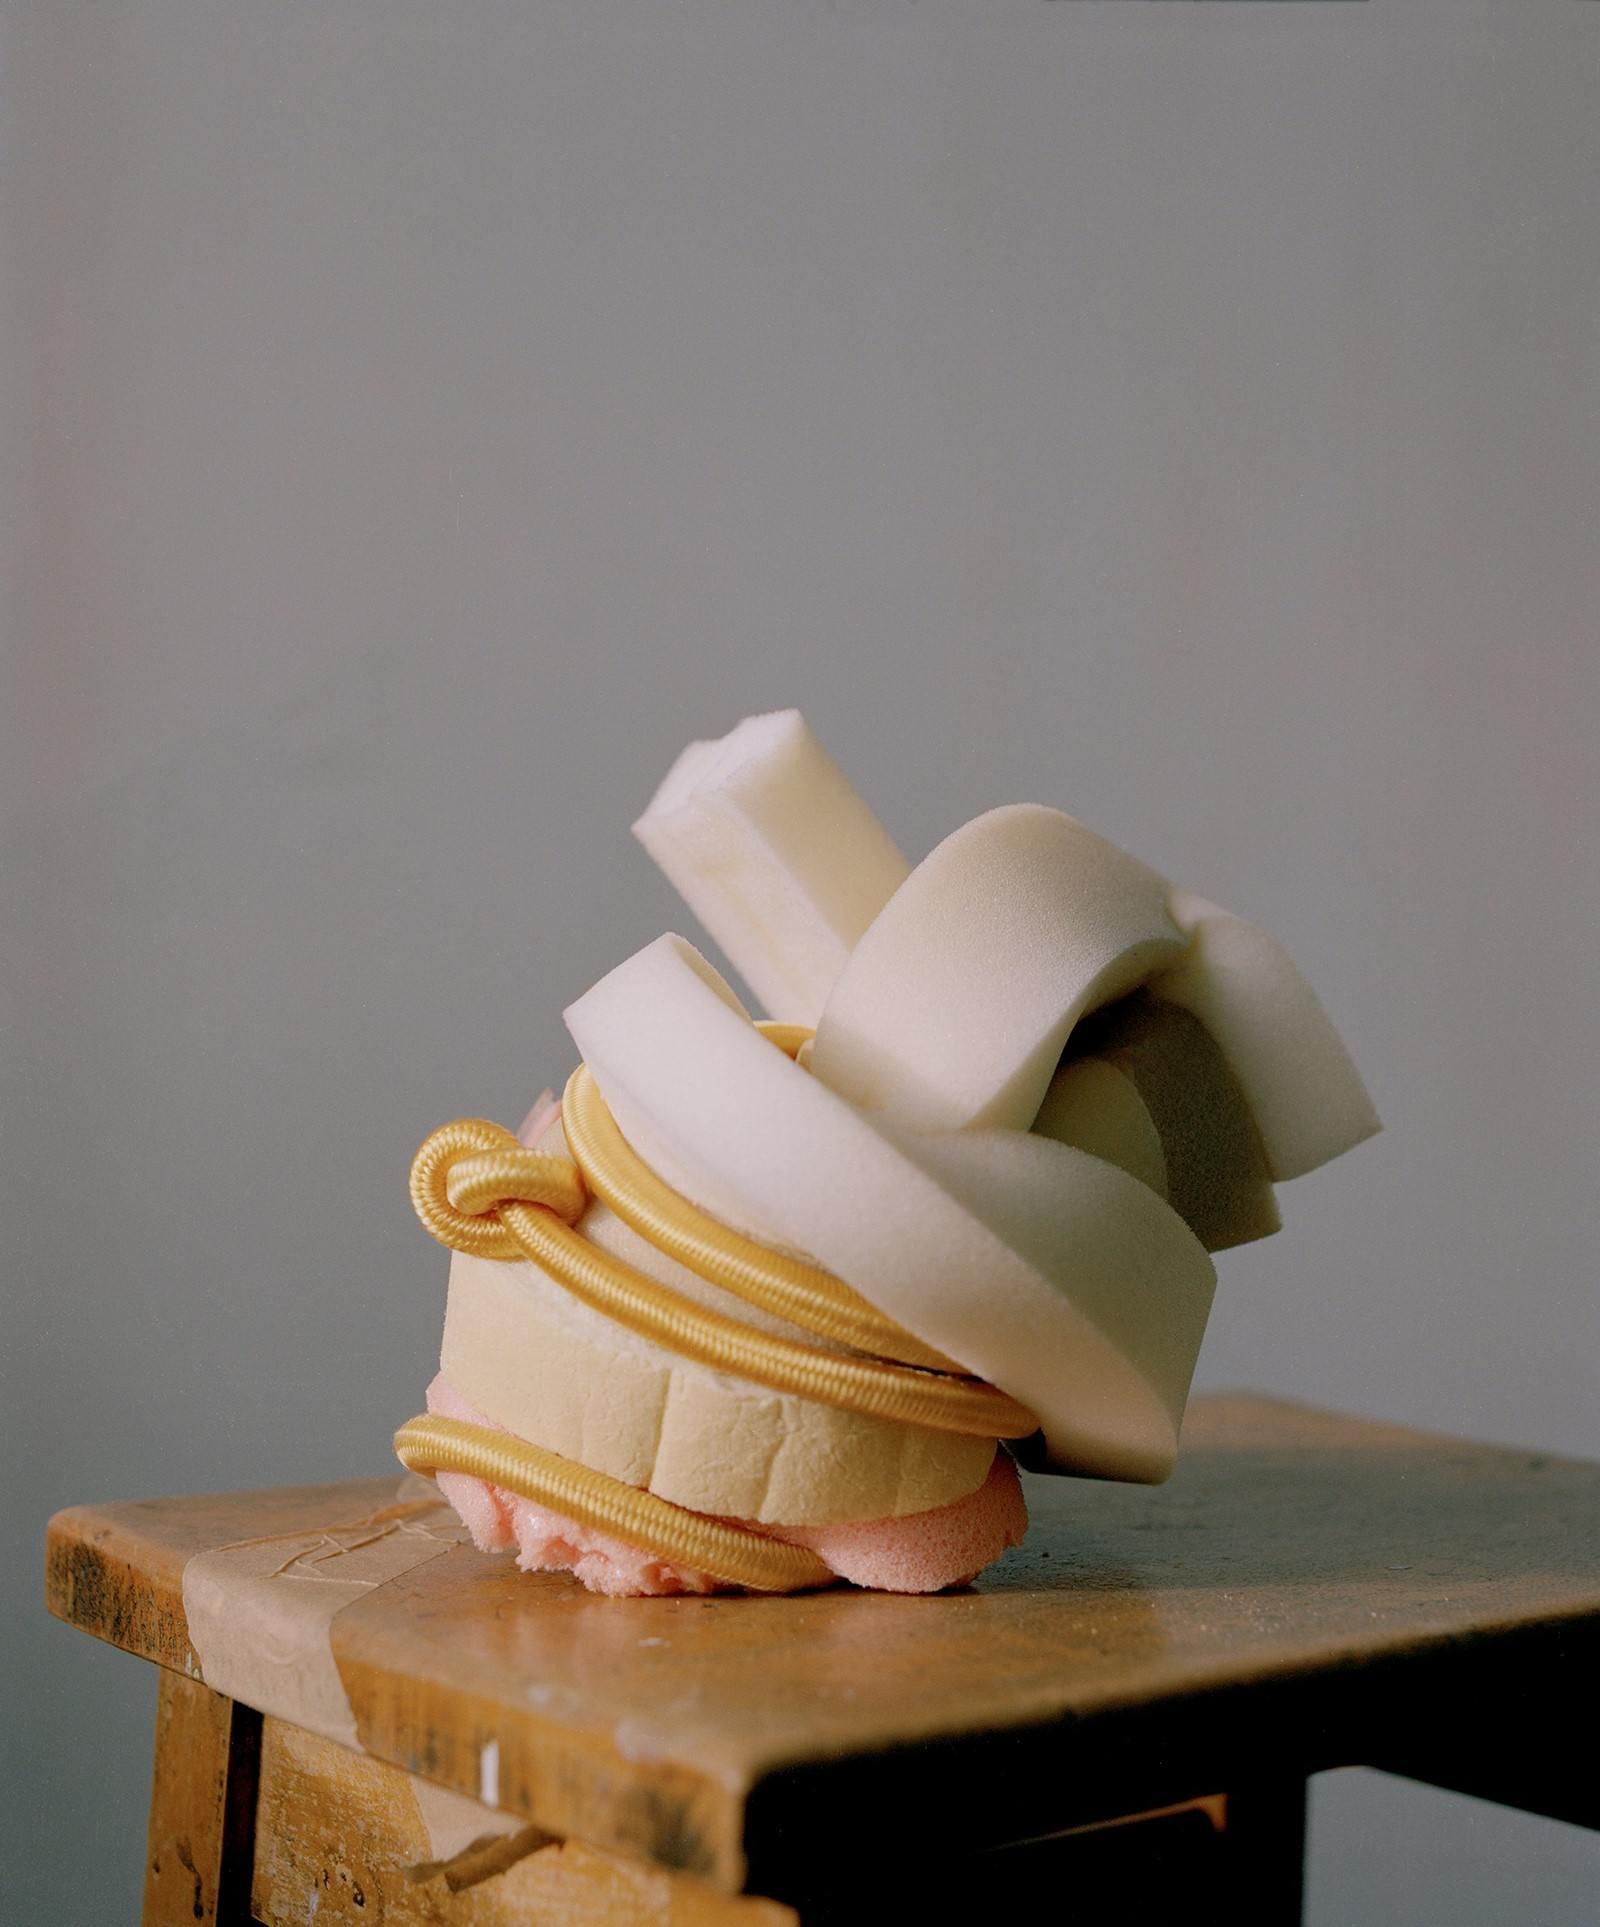 IGNANT-Art-Tine-Bek-Komfort-Skulptur-2